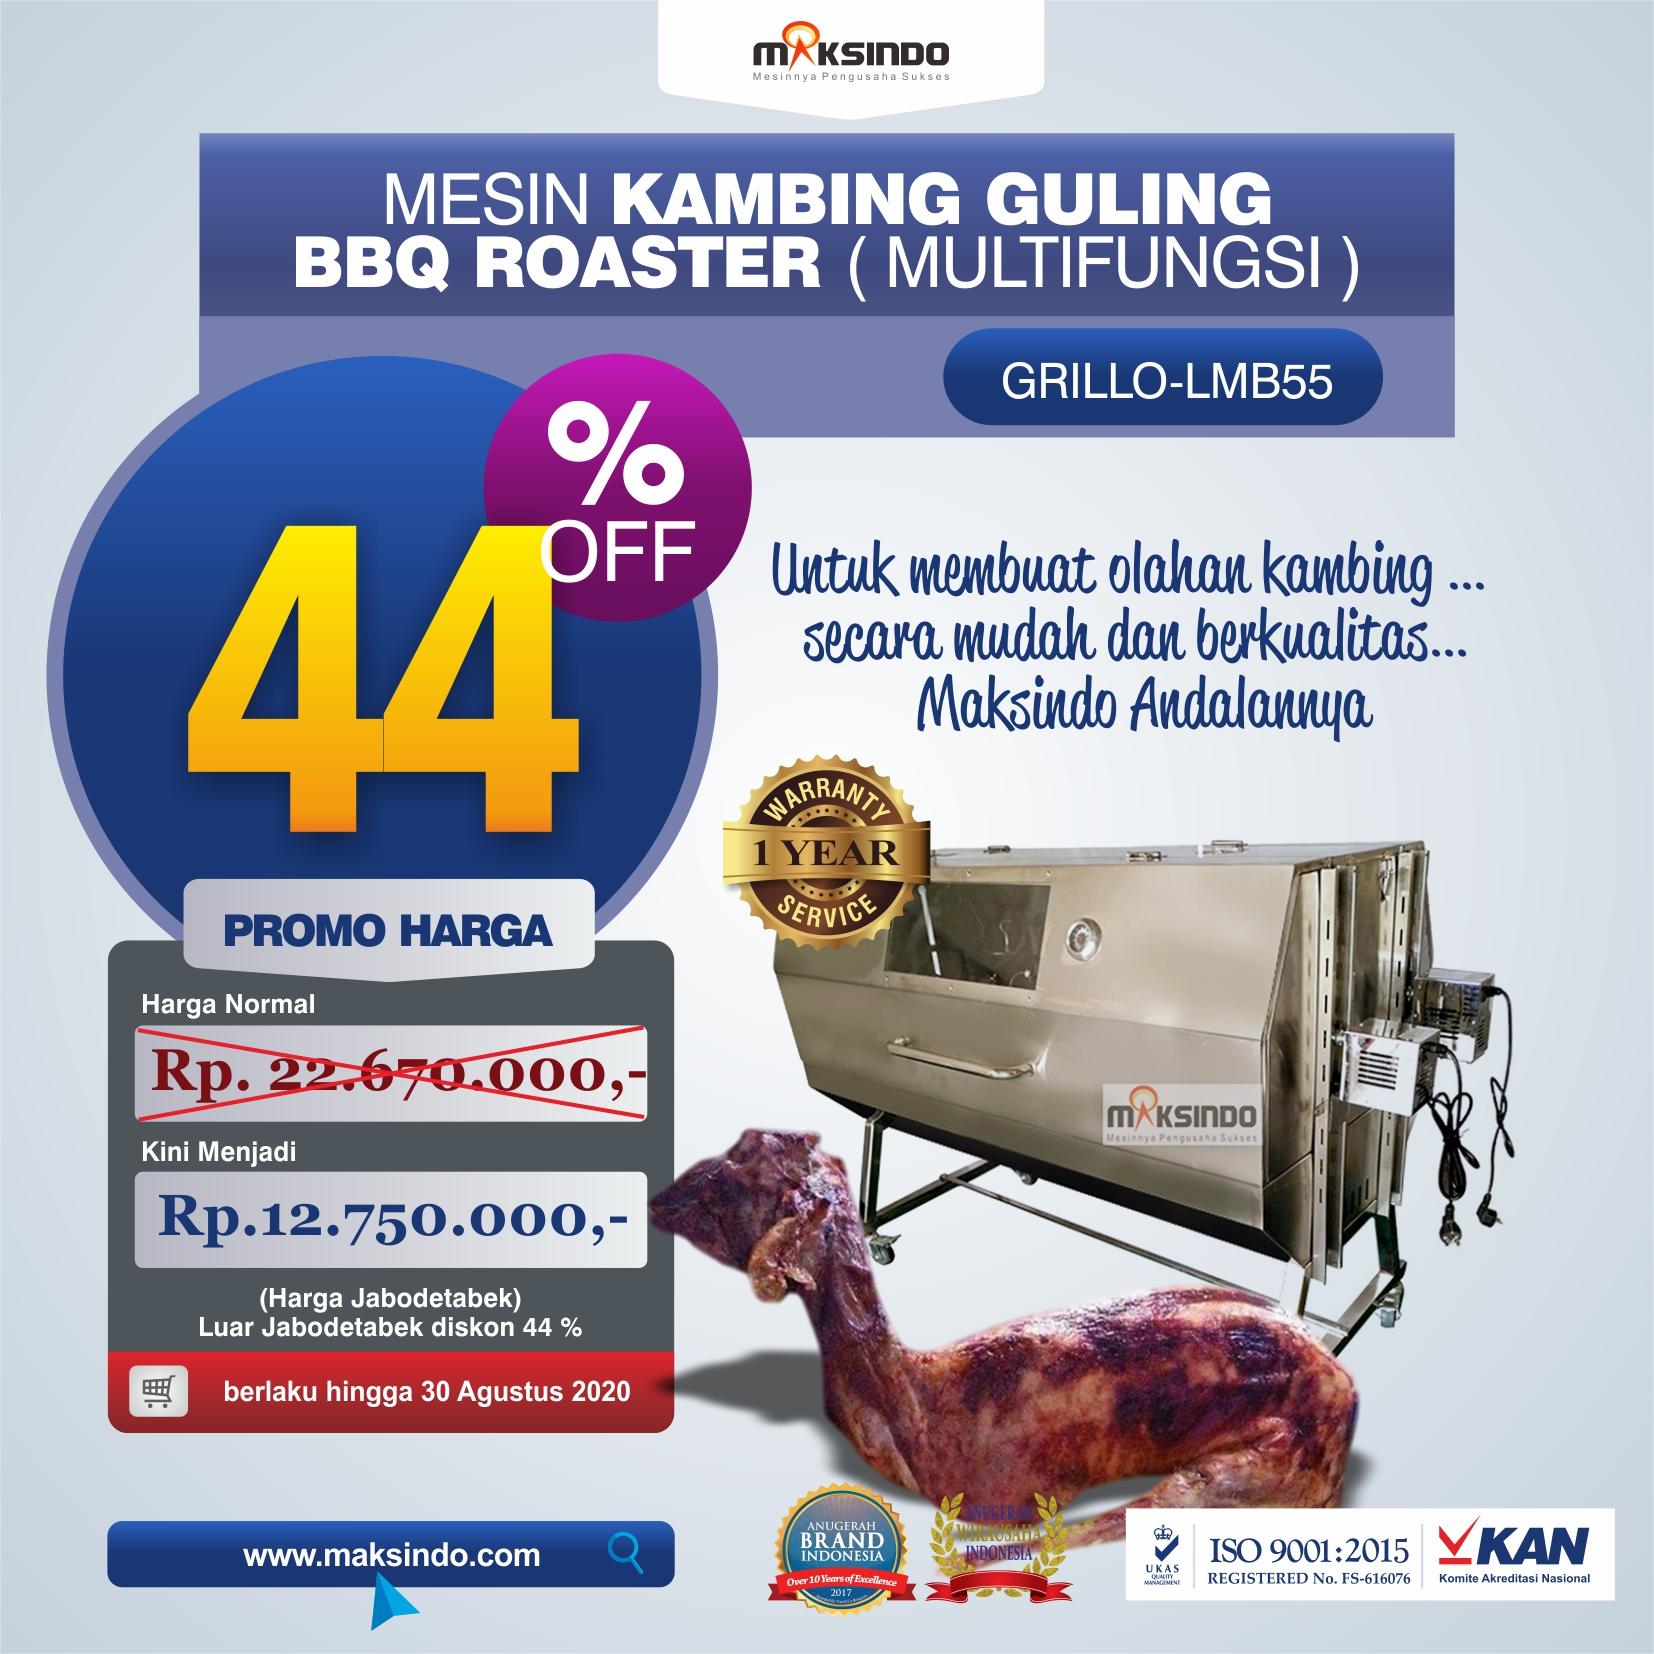 Jual Mesin Kambing Guling Double Location Roaster (GRILLO-LMB55) di Banjarmasin